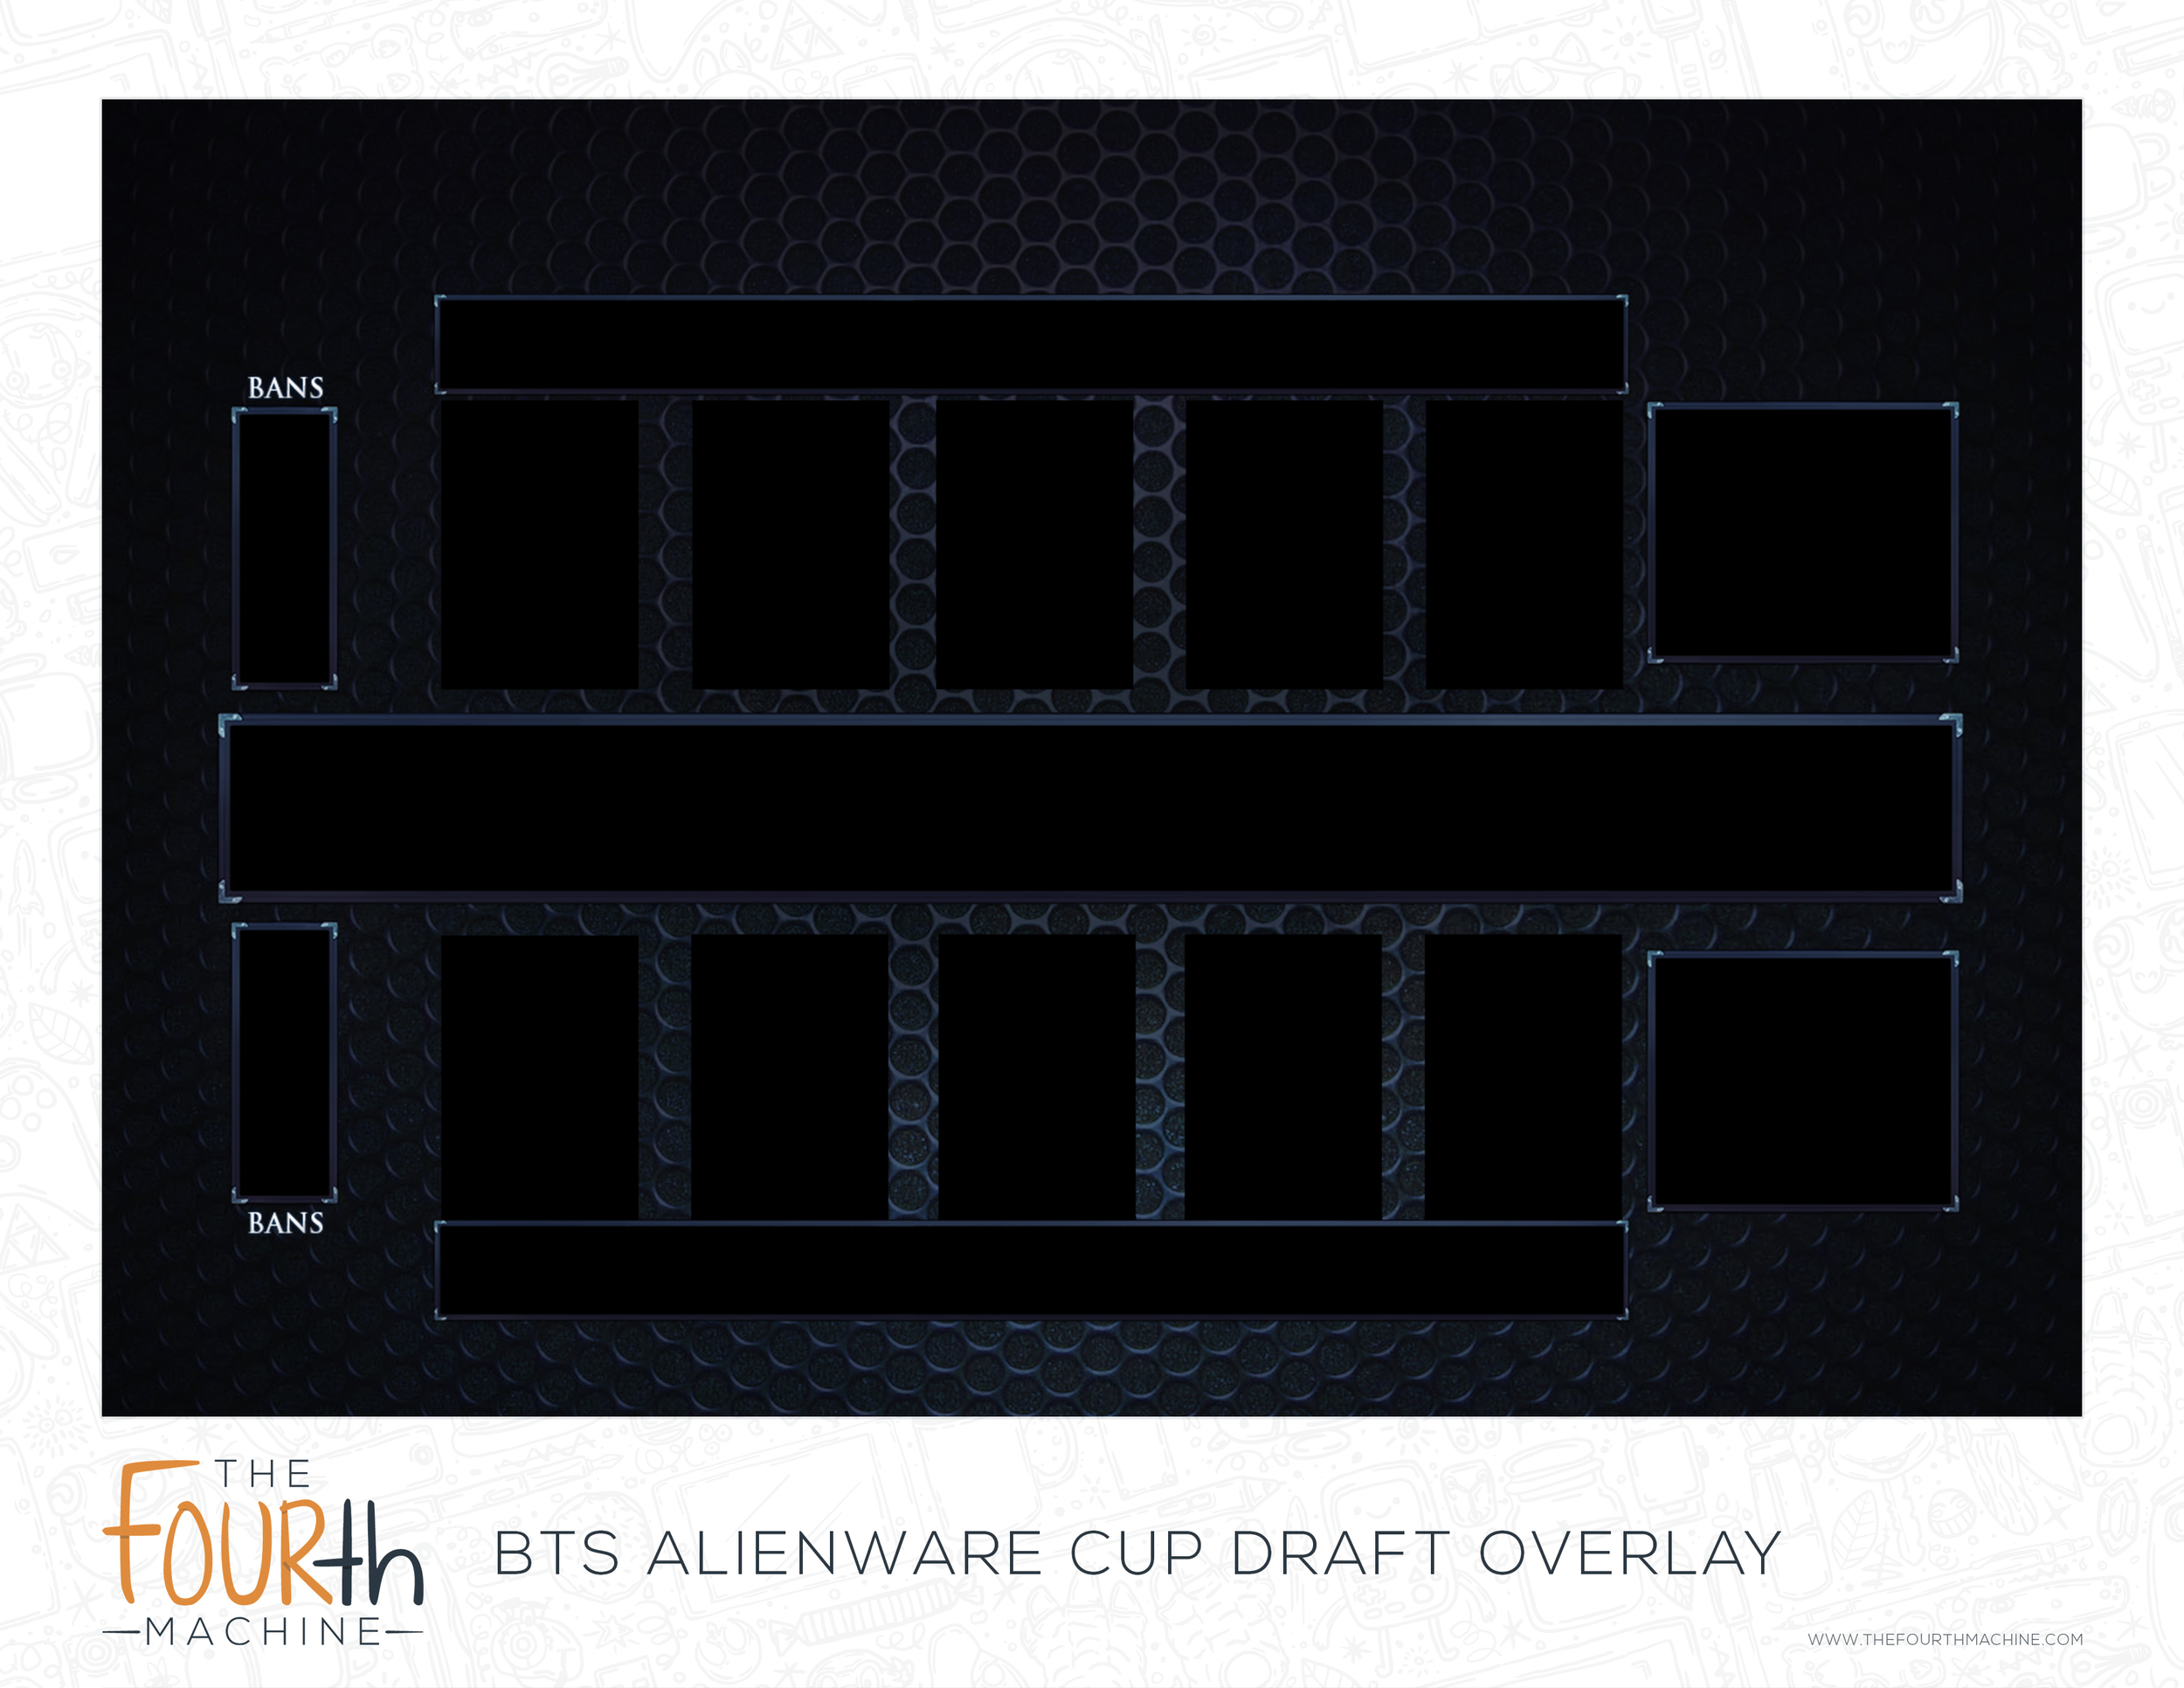 BTS_Alienware_Cup_Draft_Overlay.jpg